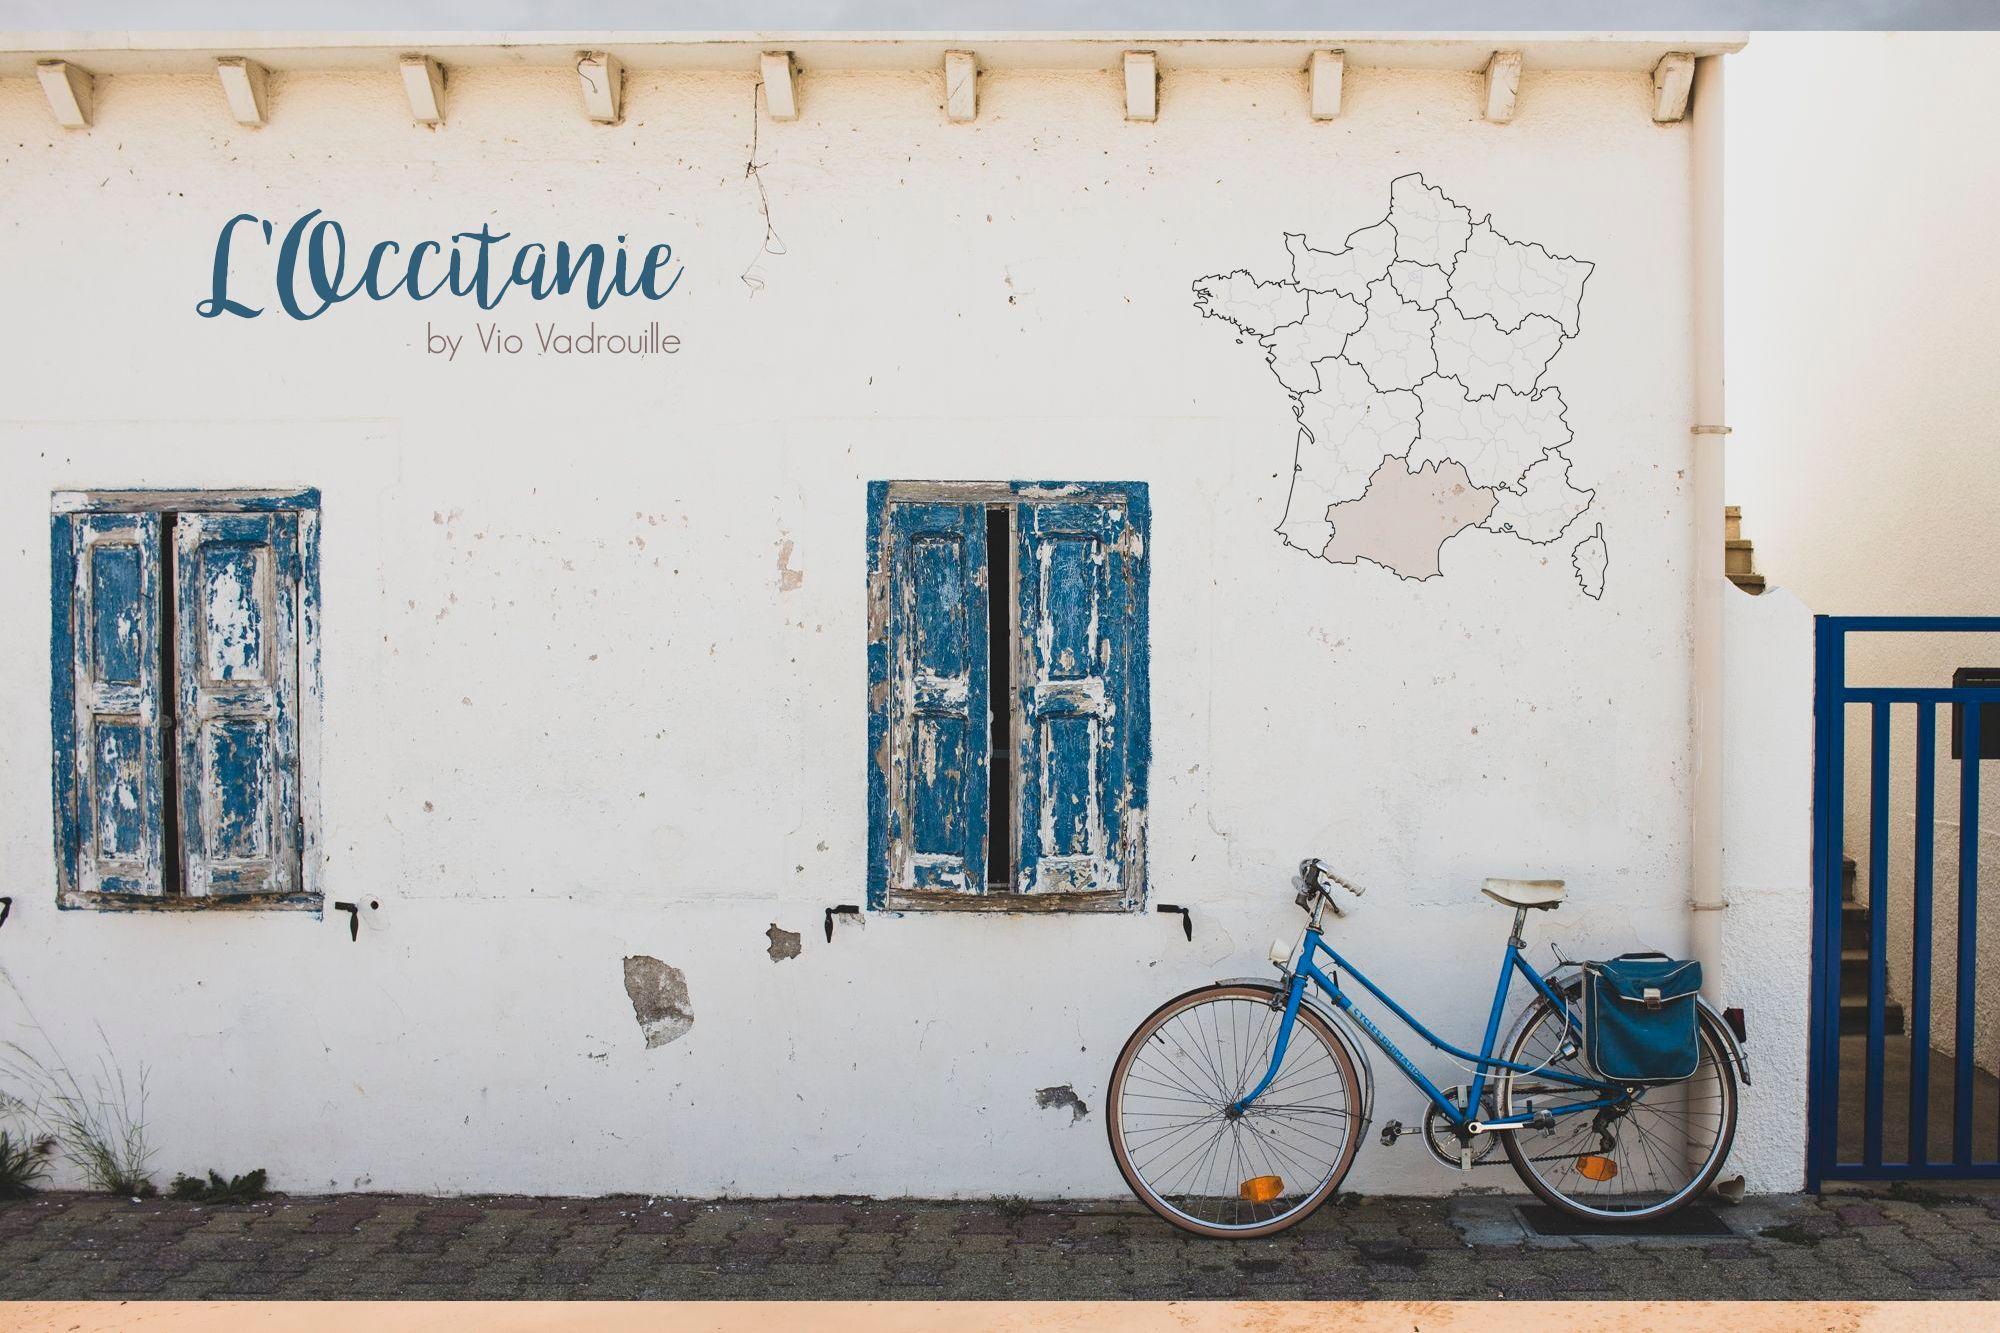 L'Occitanie en France